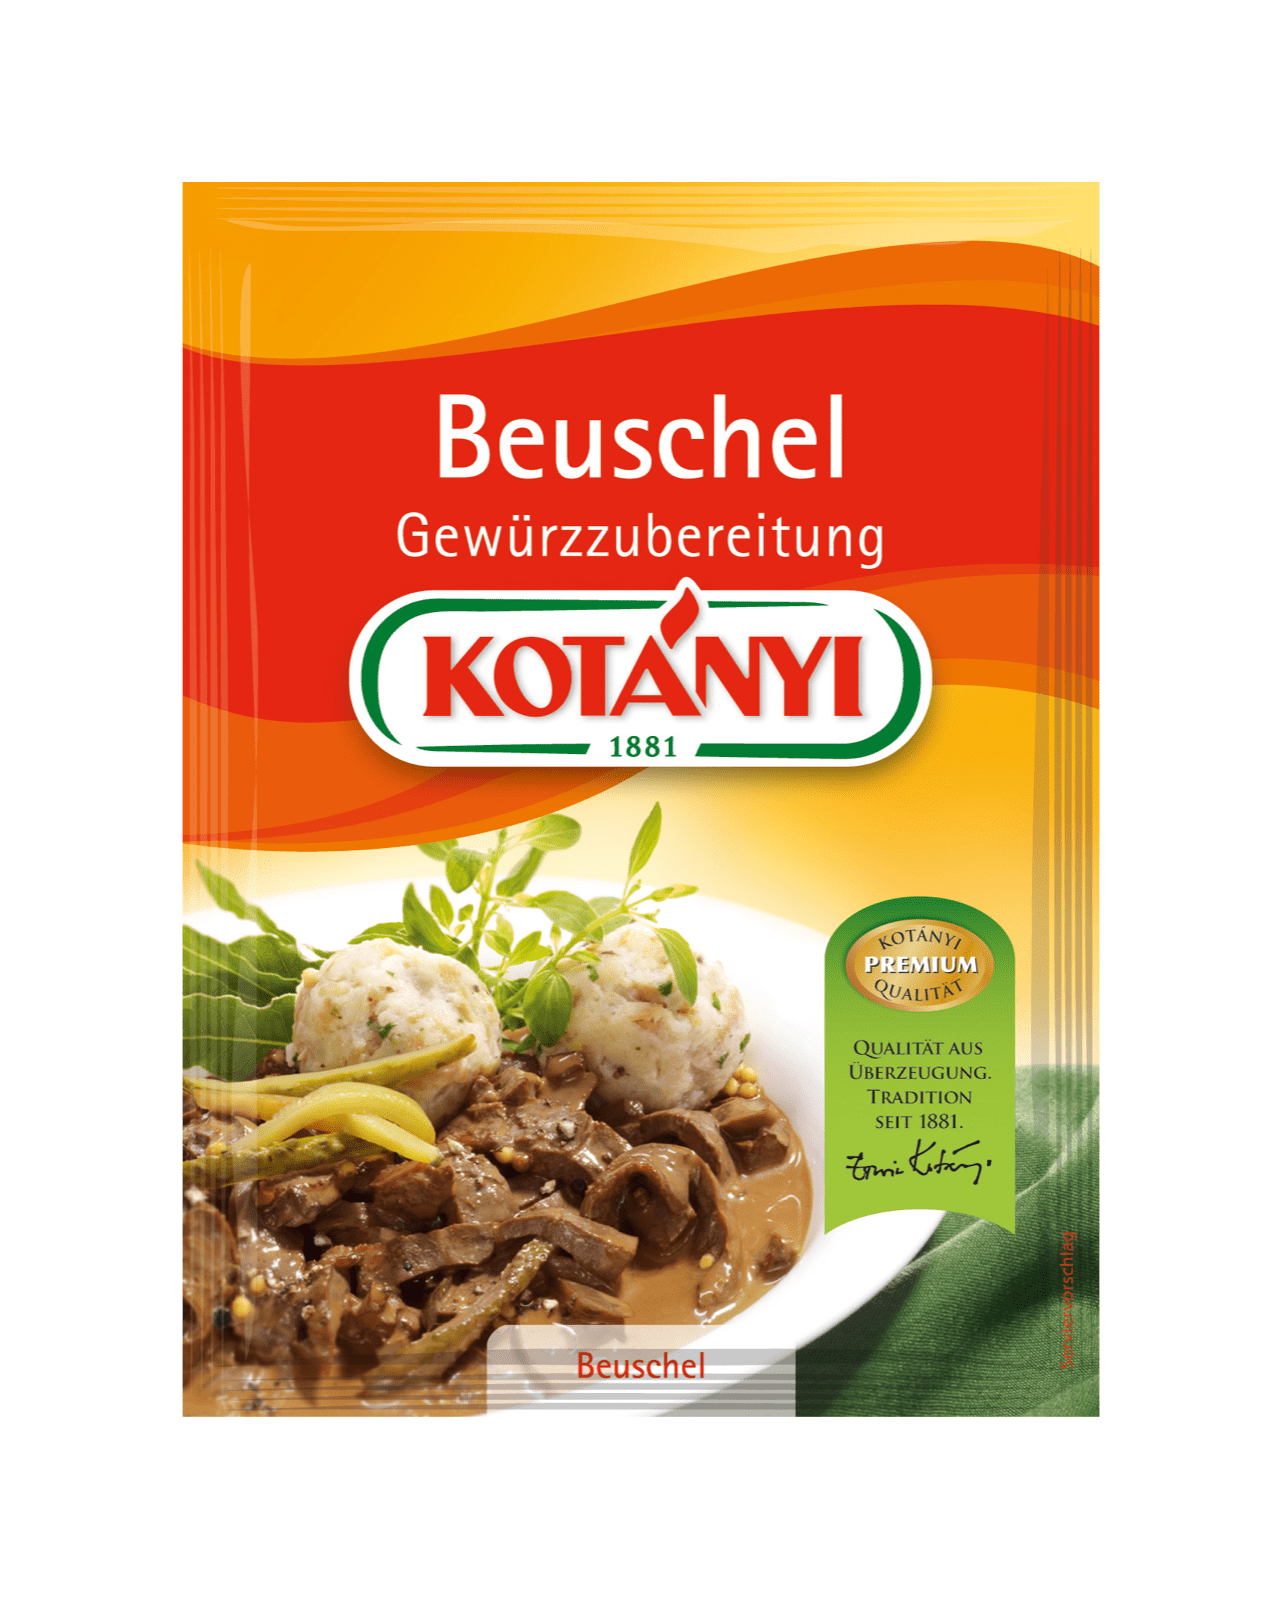 Kotányi Beuschel Gewürzzubereitung im Brief